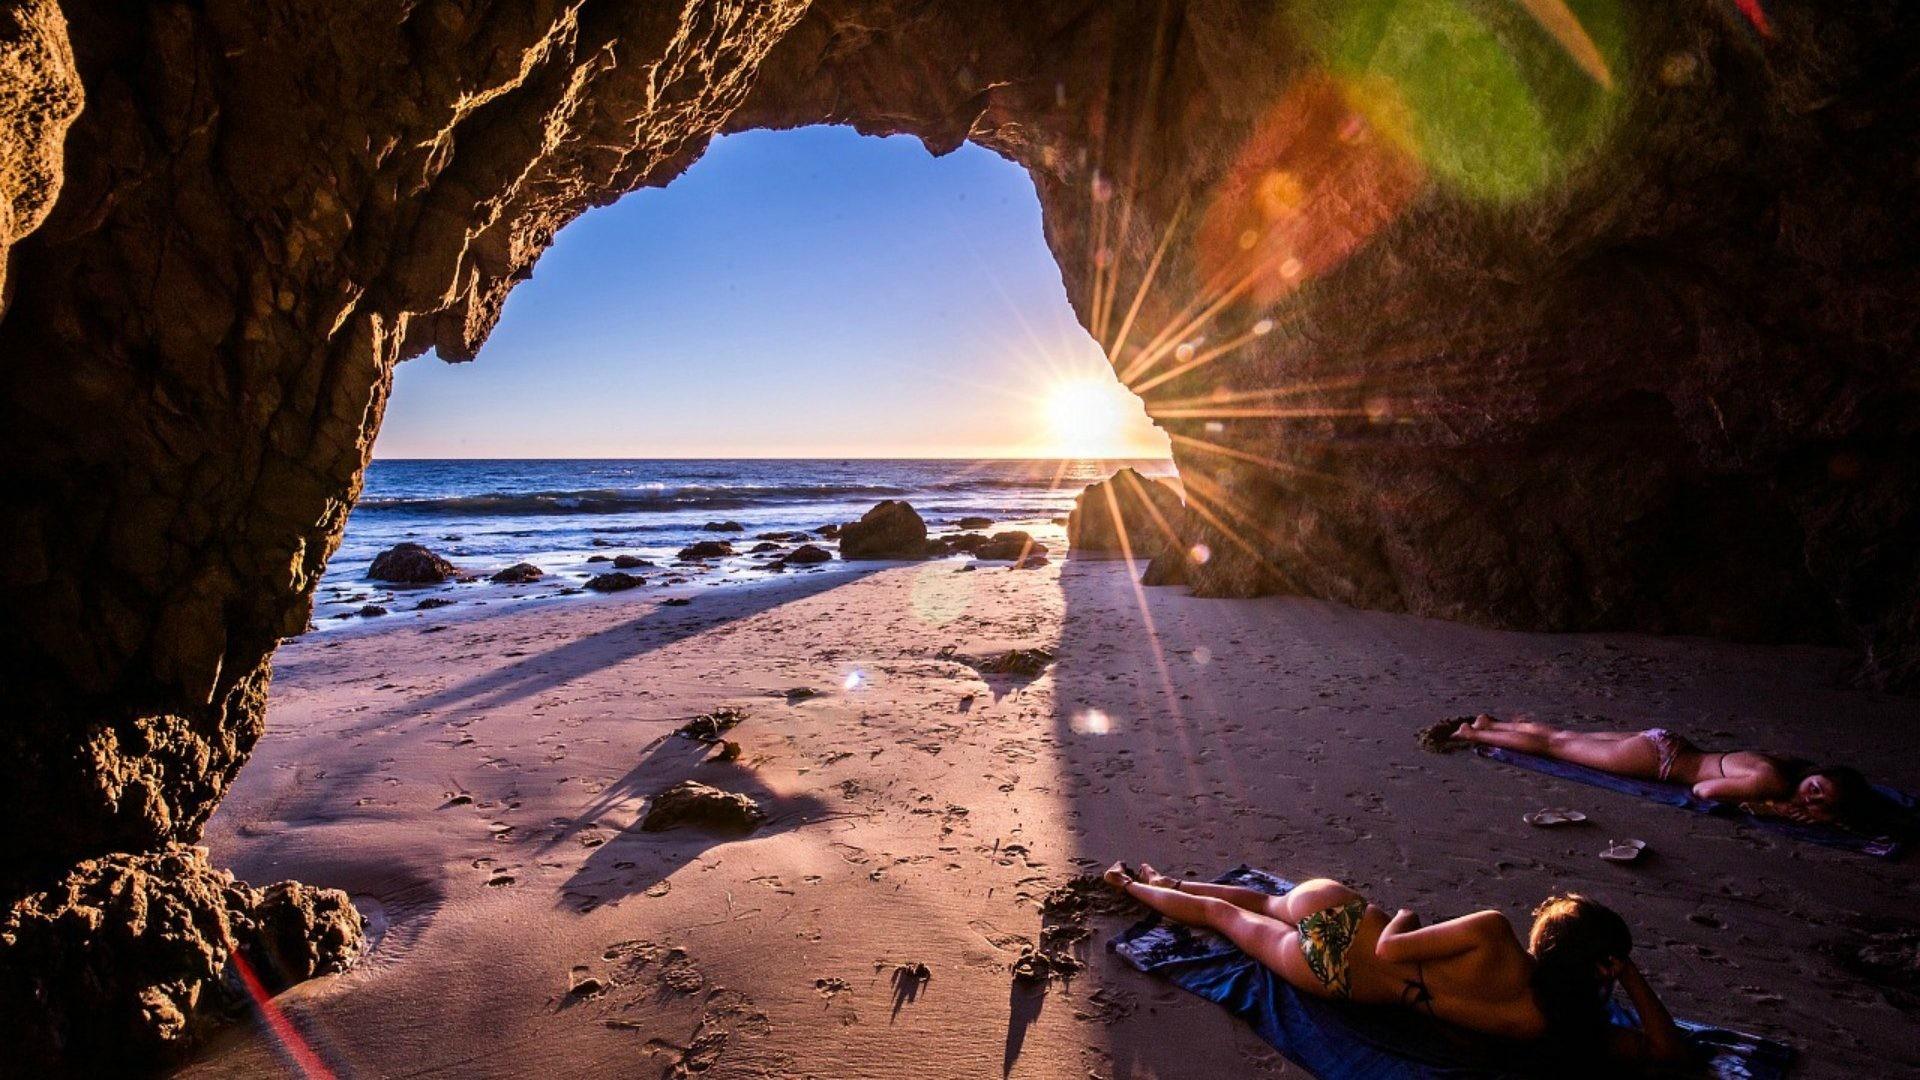 California beach wallpaper laguna voltagebd Image collections